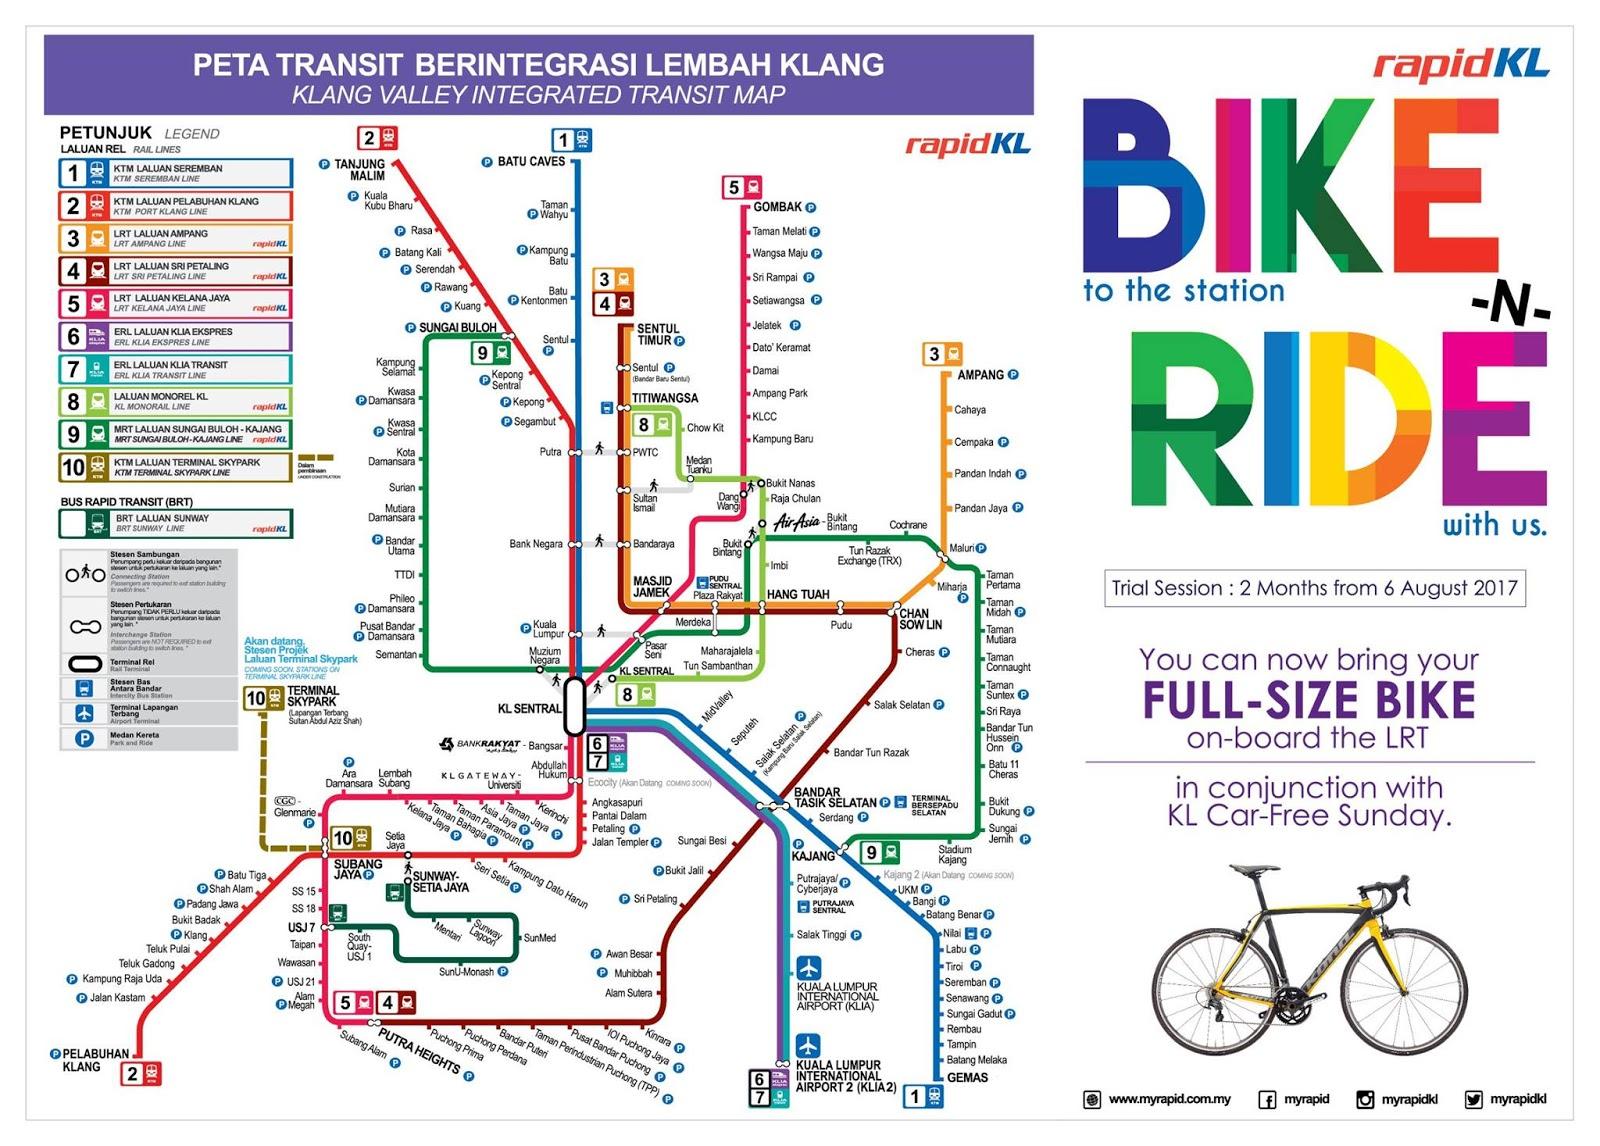 Rapid KL 50 OFF LRT MRT BRT Monorail Fares Price Until 31